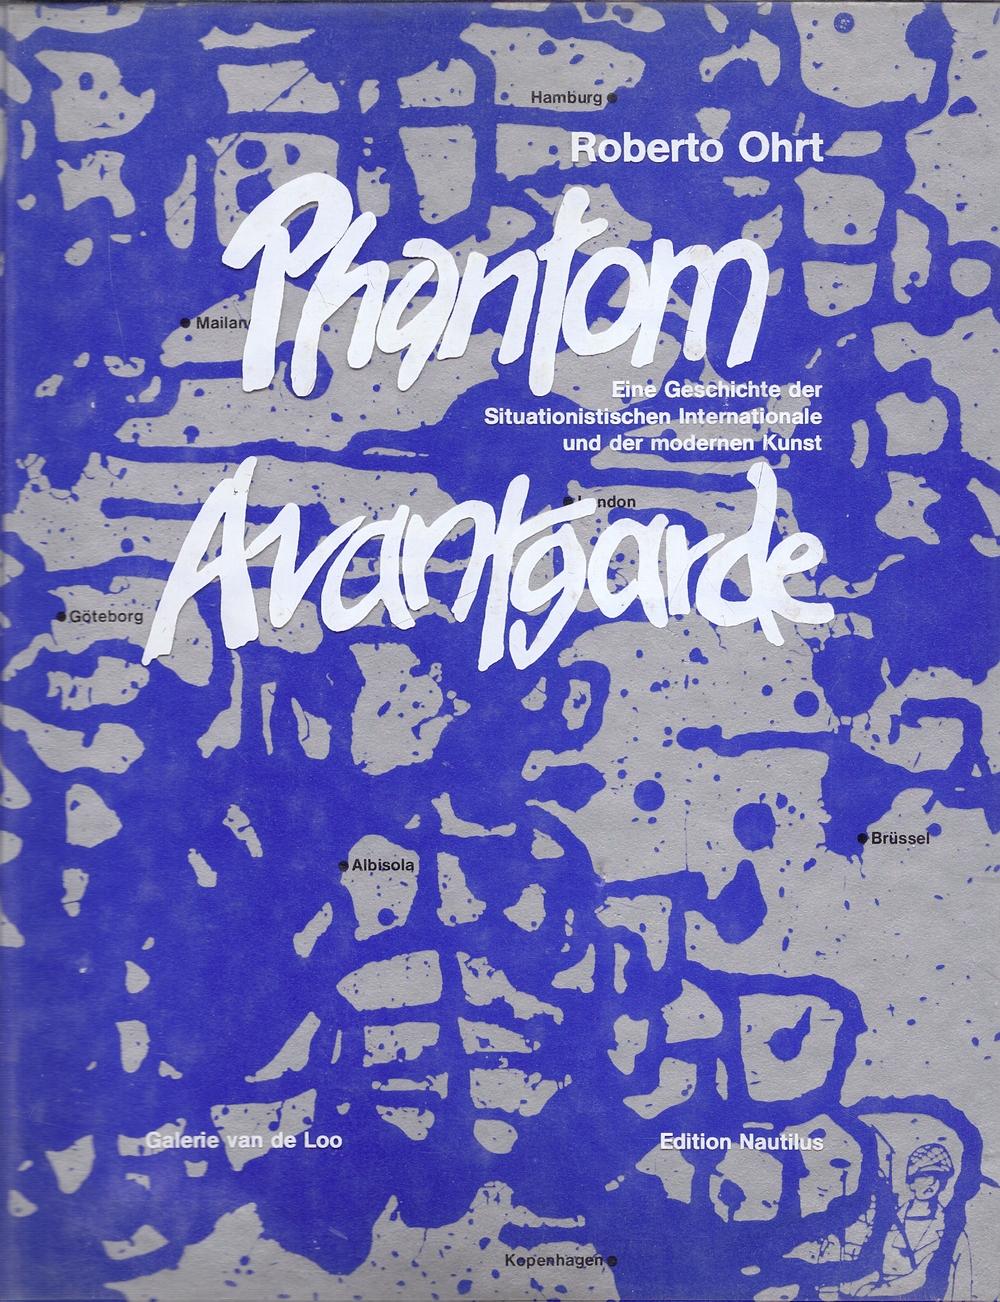 Robert Ort, Phantom Avantgarde , Galerie van de Loo, 1990